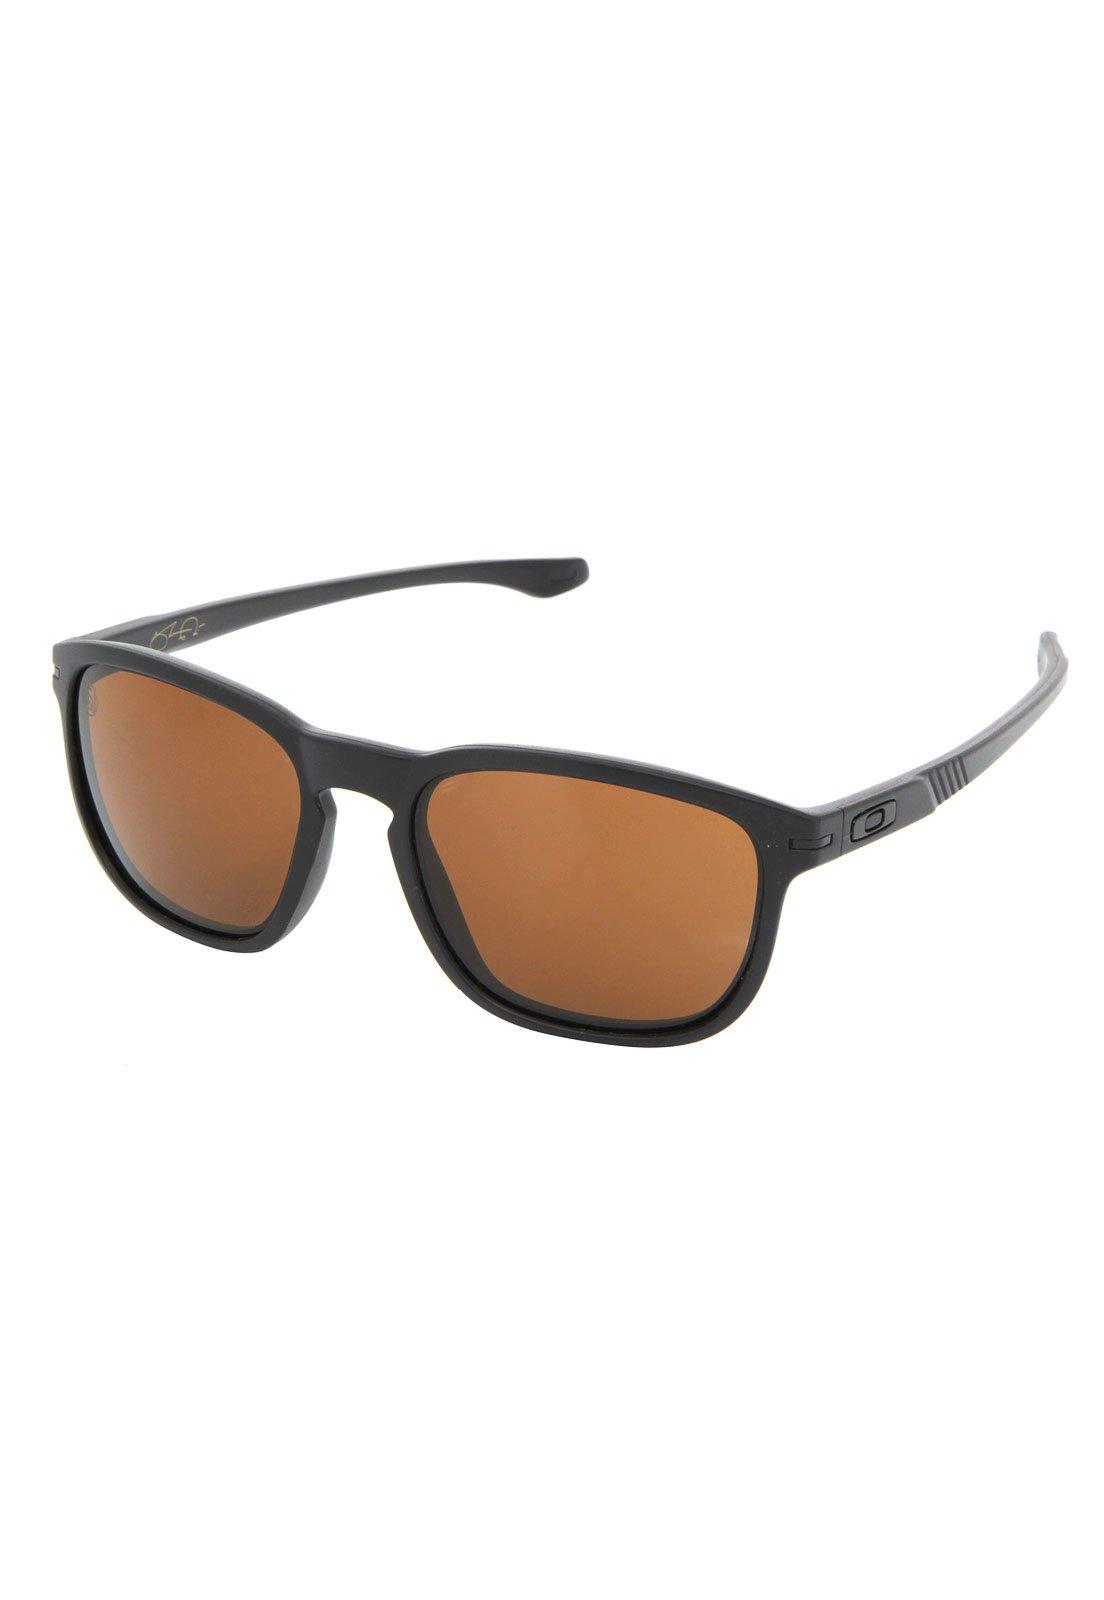 4117ce66aa4fc Óculos de Sol Oakley Enduro Preto - Compre Agora   Kanui Brasil